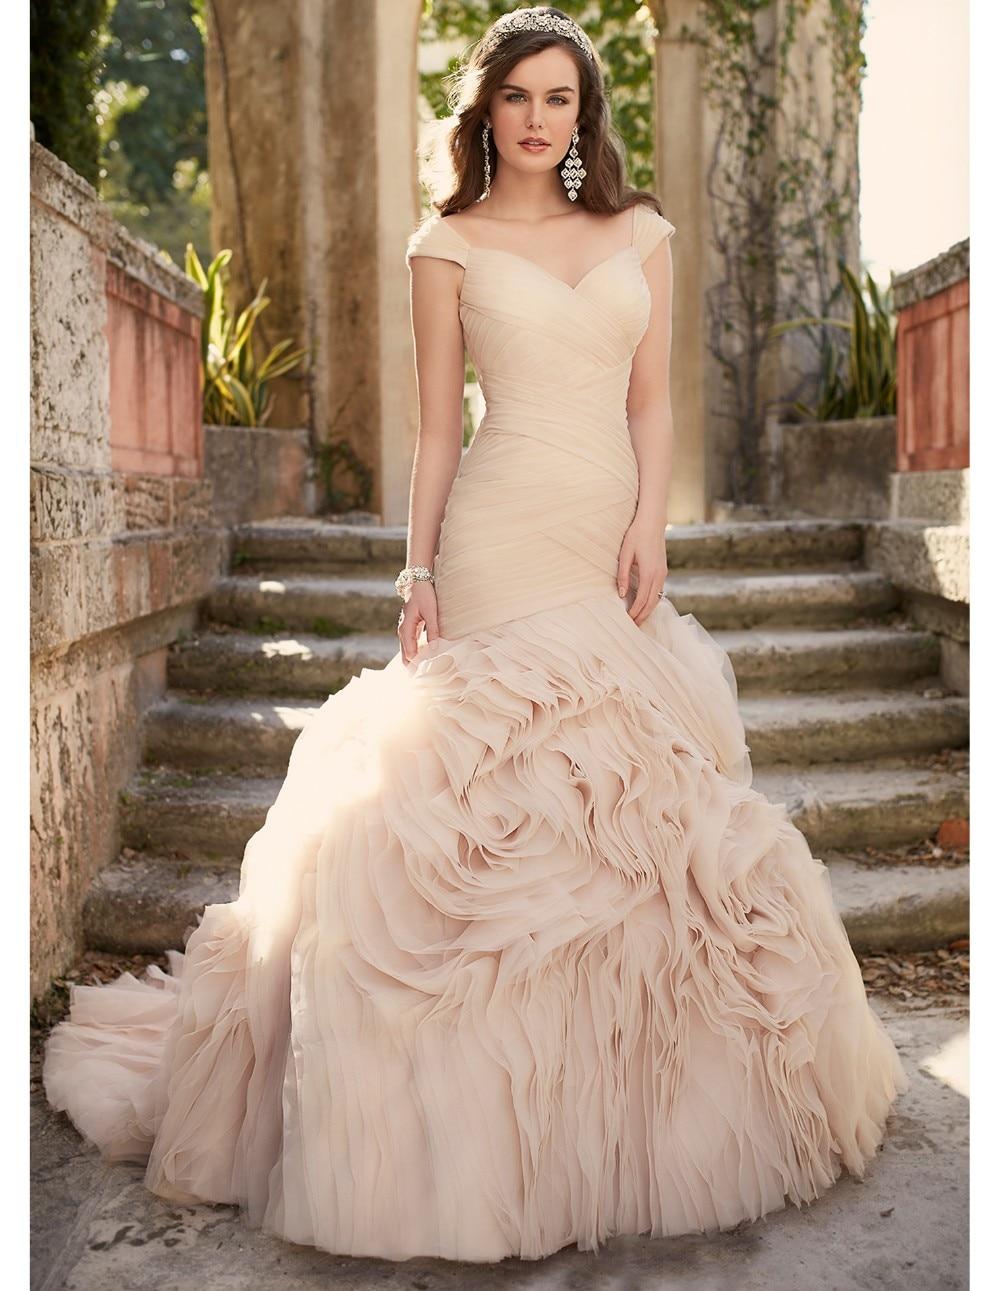 blush wedding dresses blush pink wedding dresses Stella York Spring Bridal Collection Blush Colored Wedding DressStella